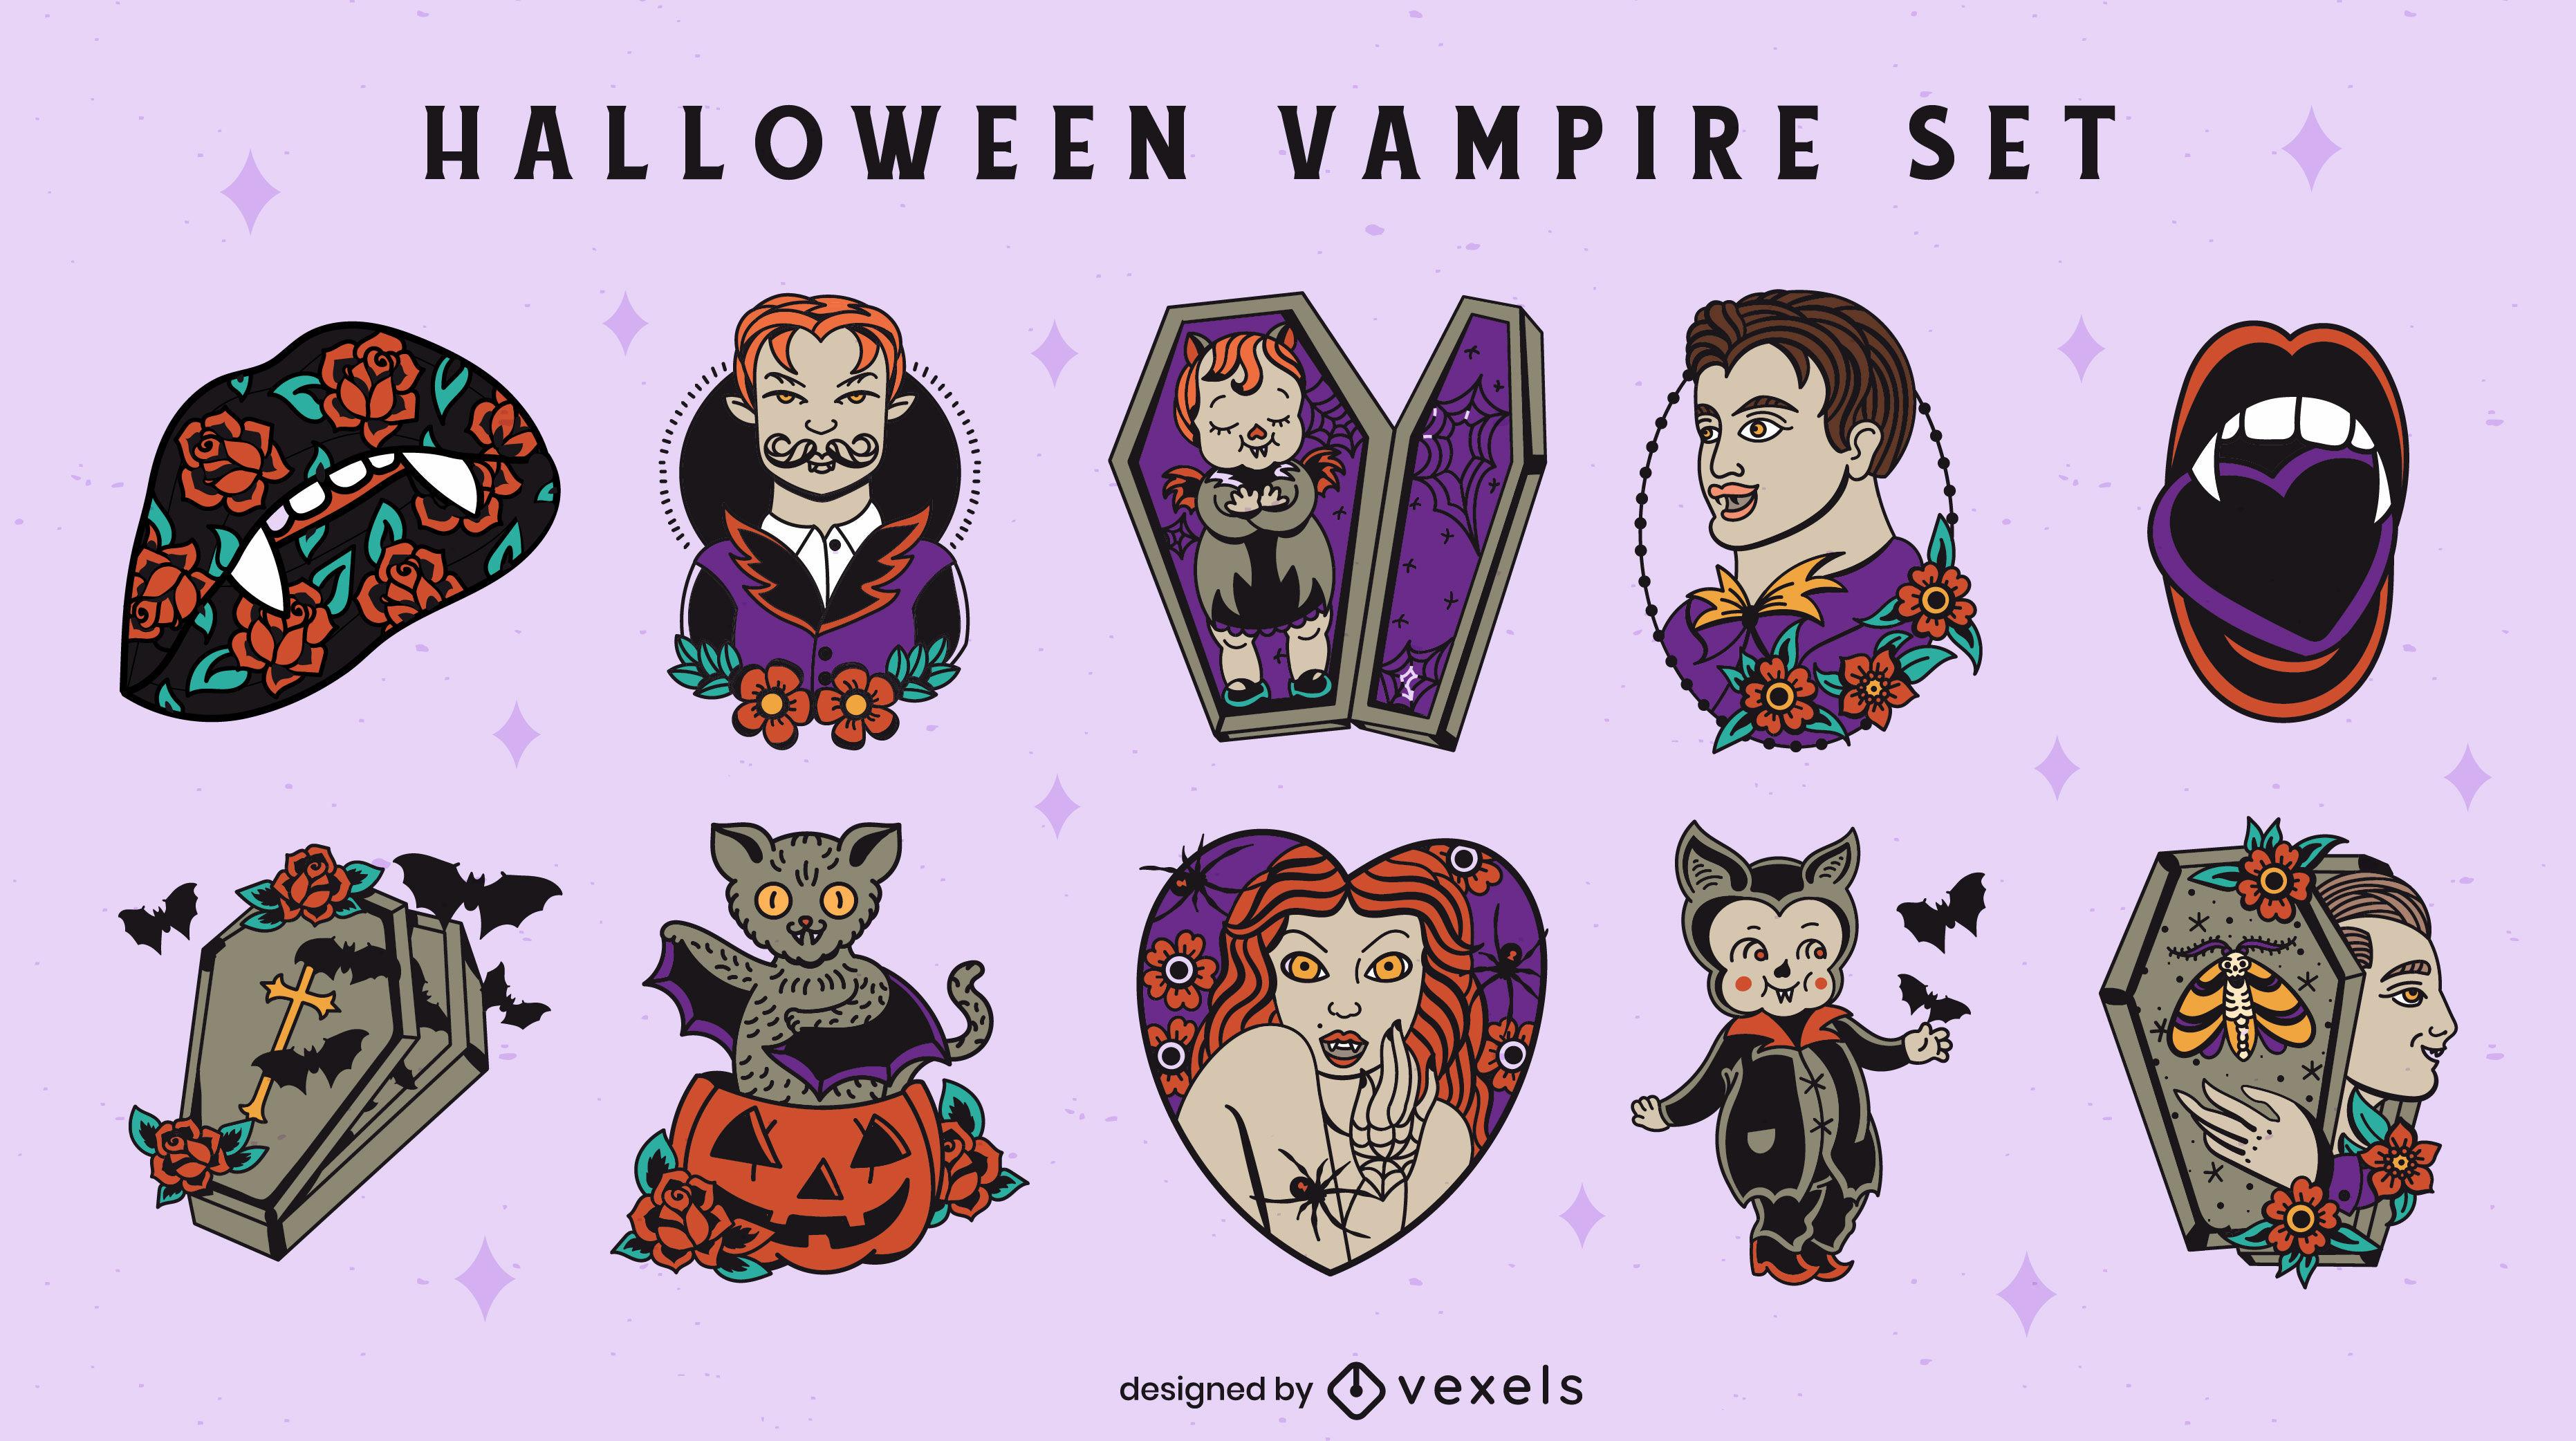 Estilo de tatuagem da velha escola de vampiros de Halloween